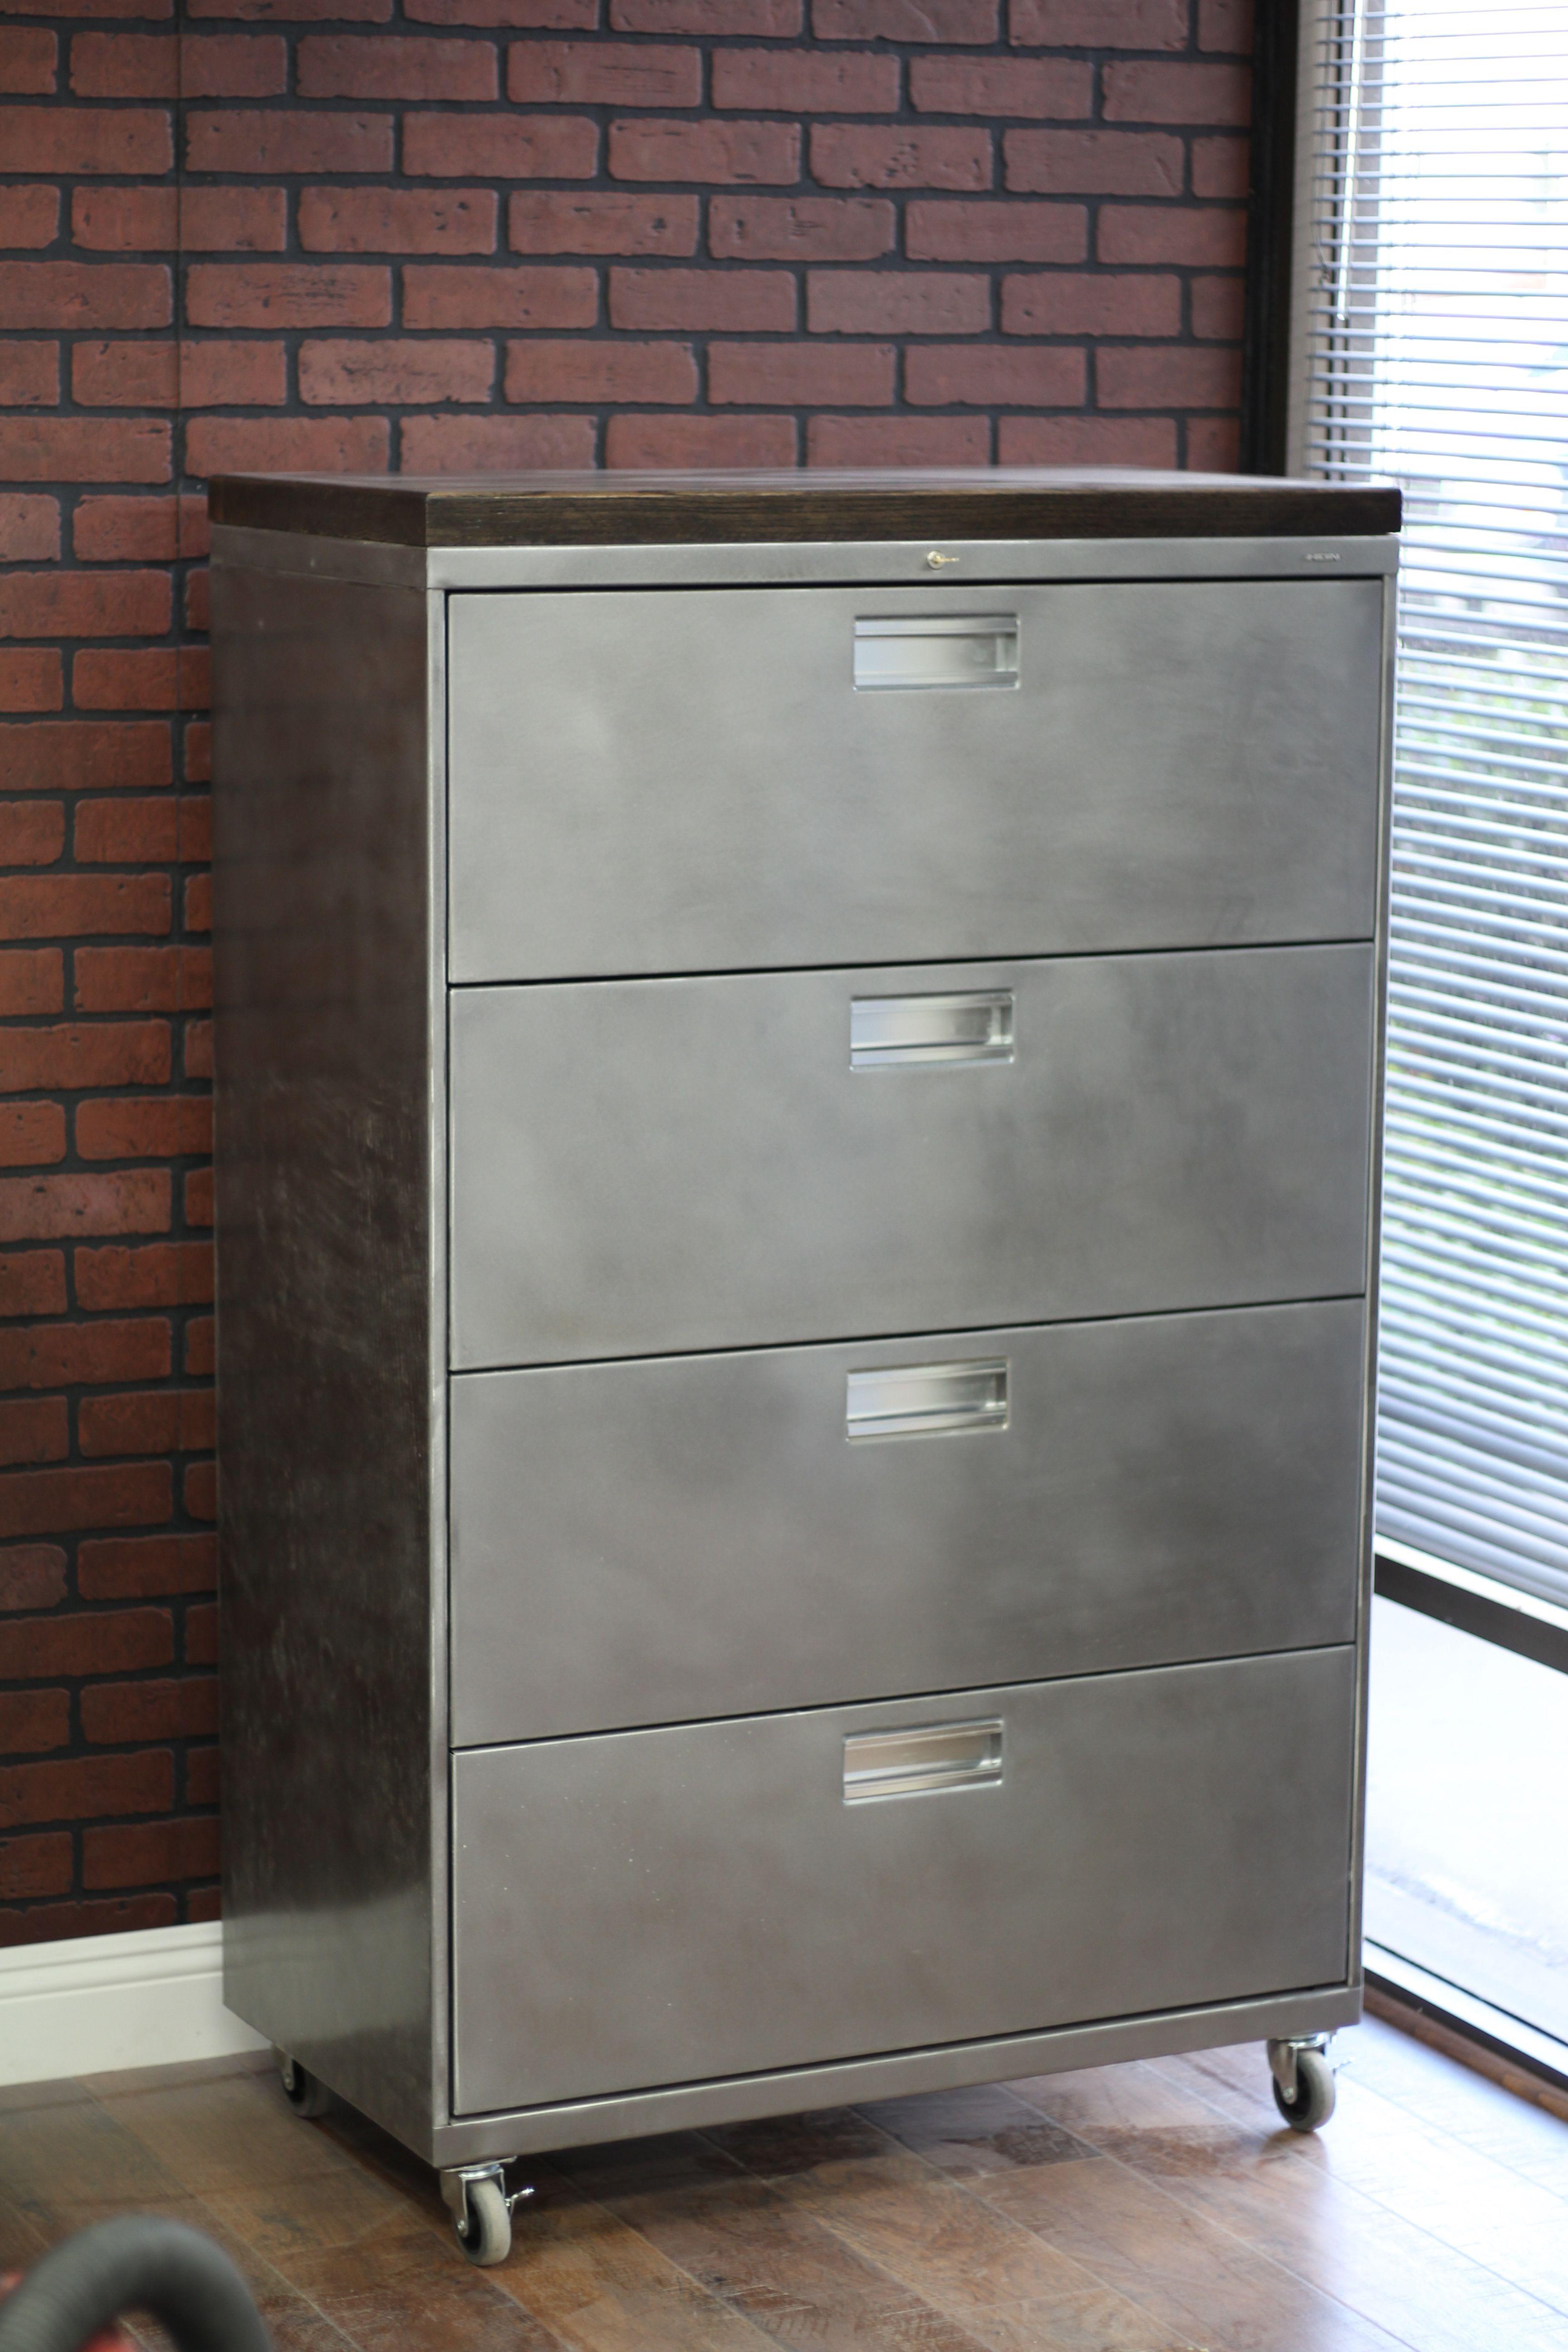 Refinished Large 4 Drawer Metal Filing Cabinet W Wood Top Etsy Filing Cabinet Metal Filing Cabinet Cabinet